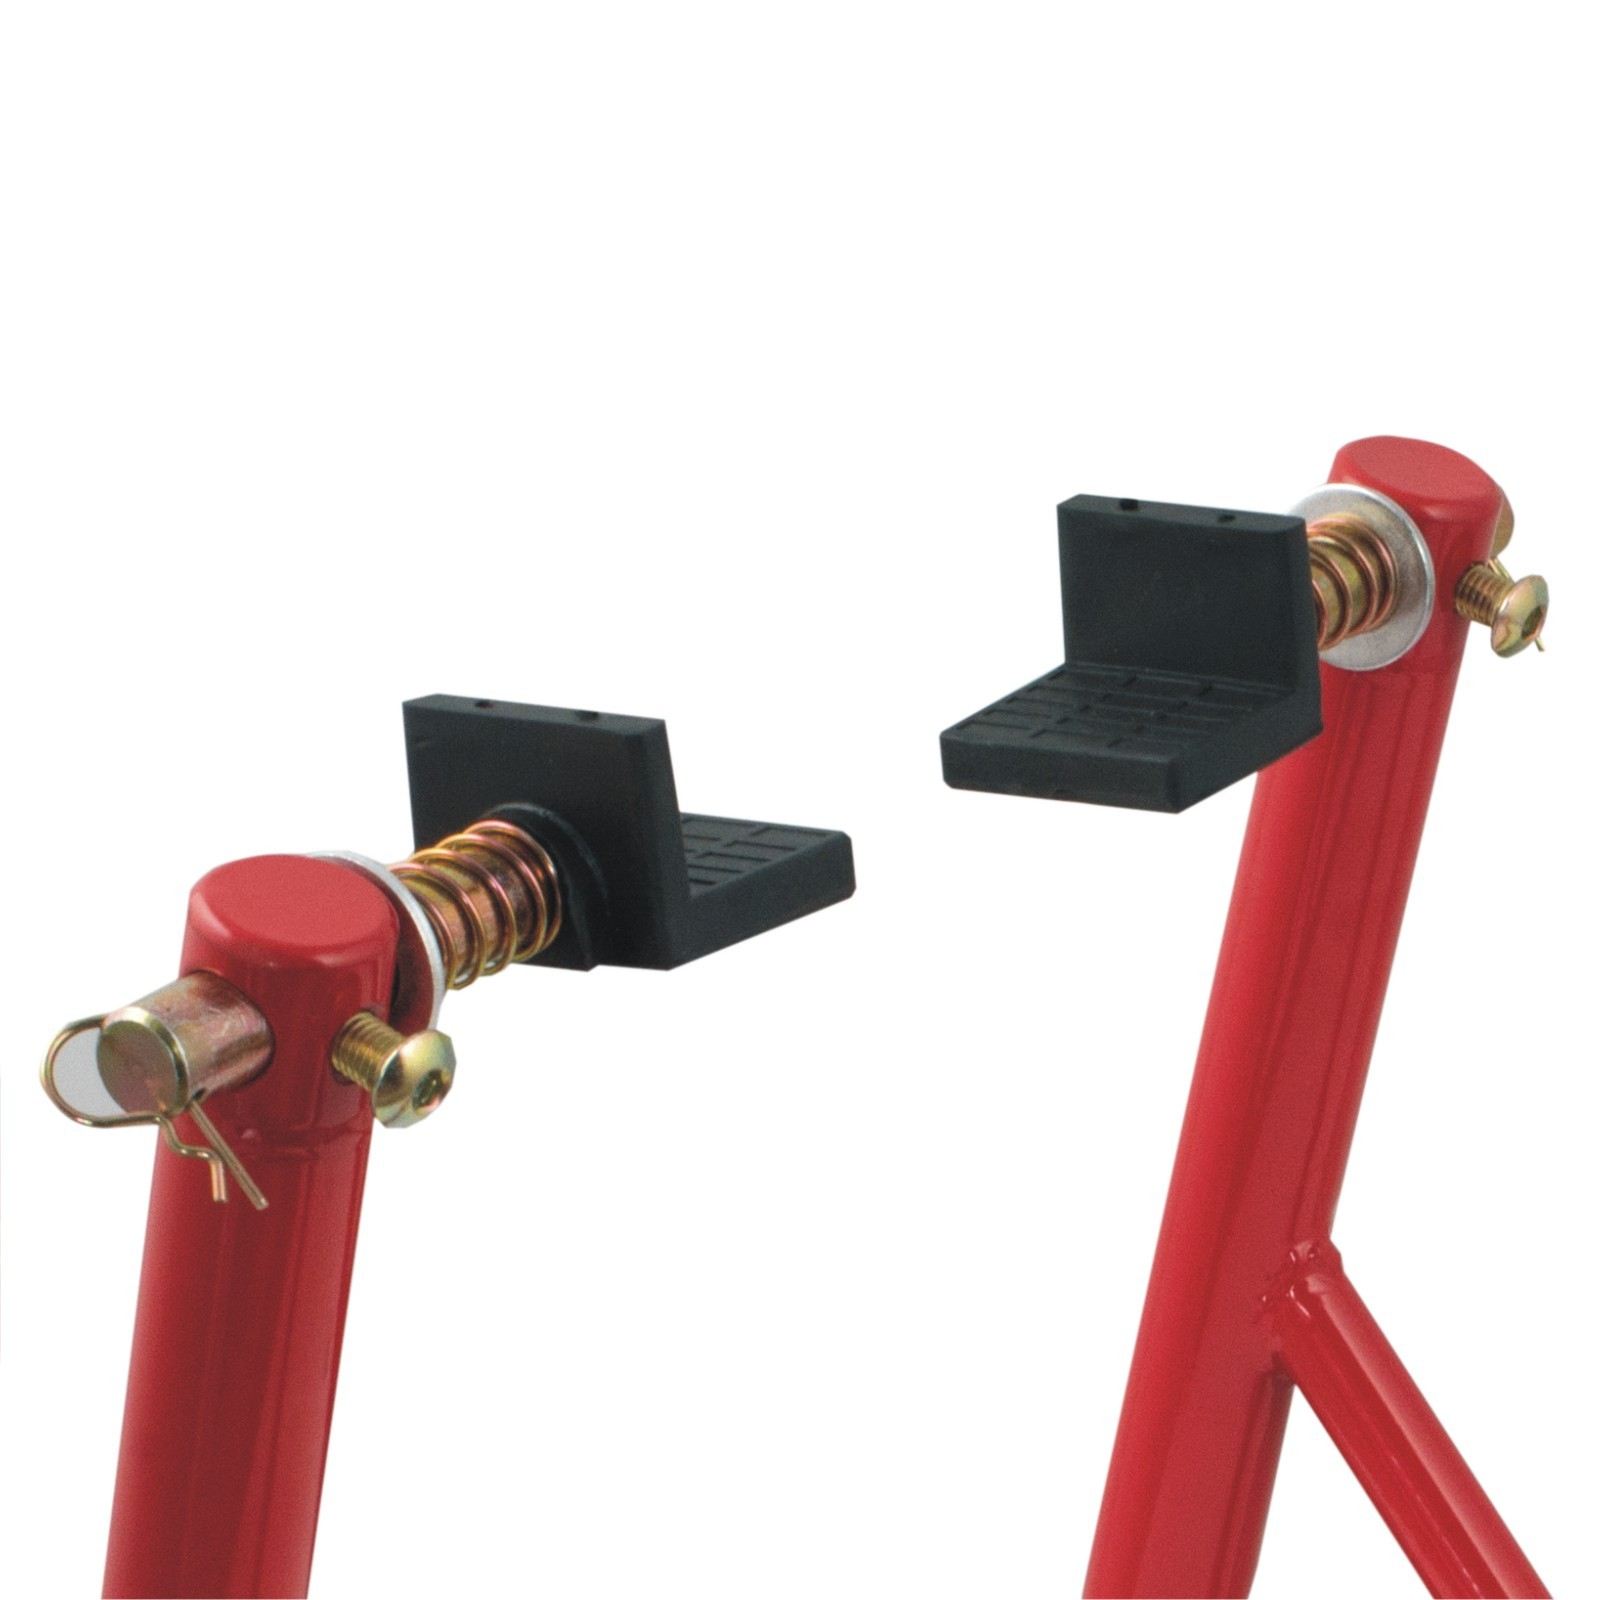 CR7205-A-Pro-Supporto-Adattatore-Adapter-Cavalletto-Stand-Moto-Motorcycle-Sonic-Moto